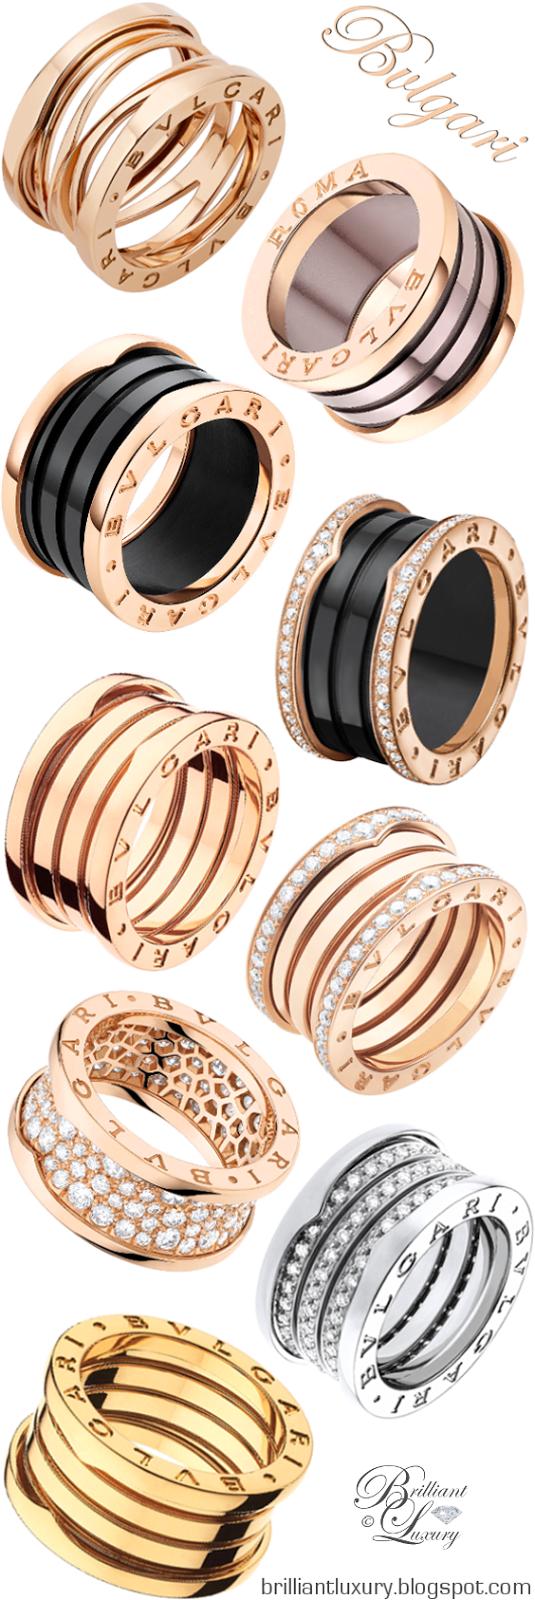 brilliant luxury bvlgari bzero1 rings udated